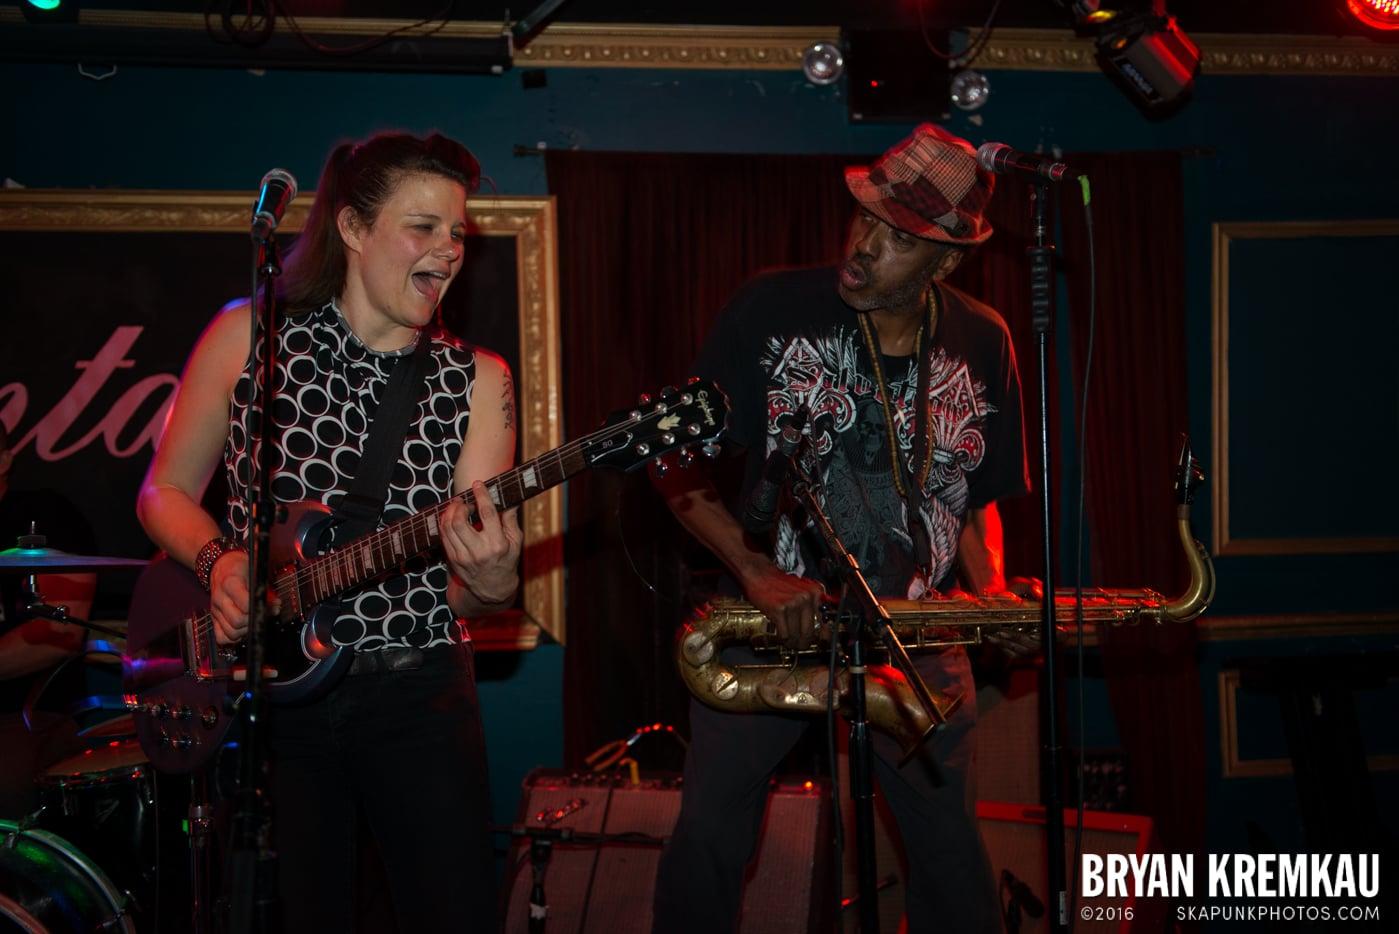 Roddy Radiation & The Scotch Bonnets @ Fontana's, NYC - 4.25.15 (11)